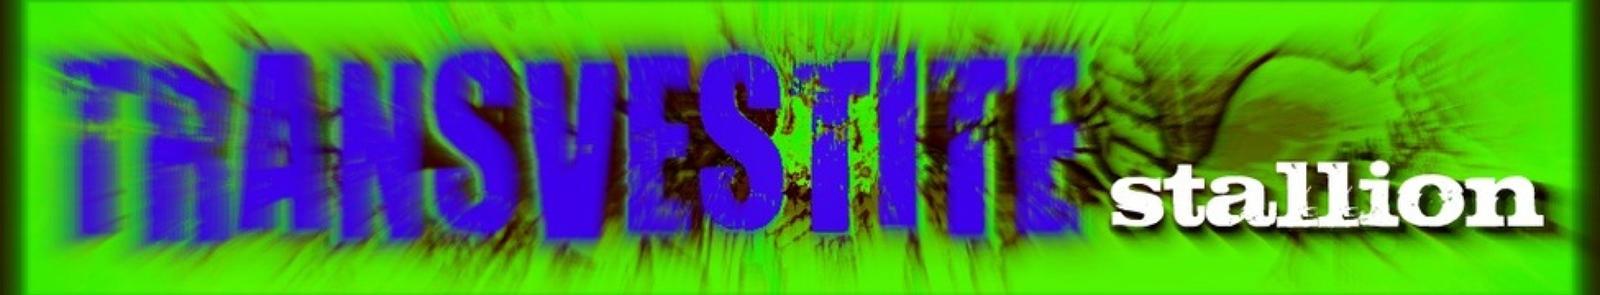 New TRANSVESTITEstallion Logo by MushroomBrain